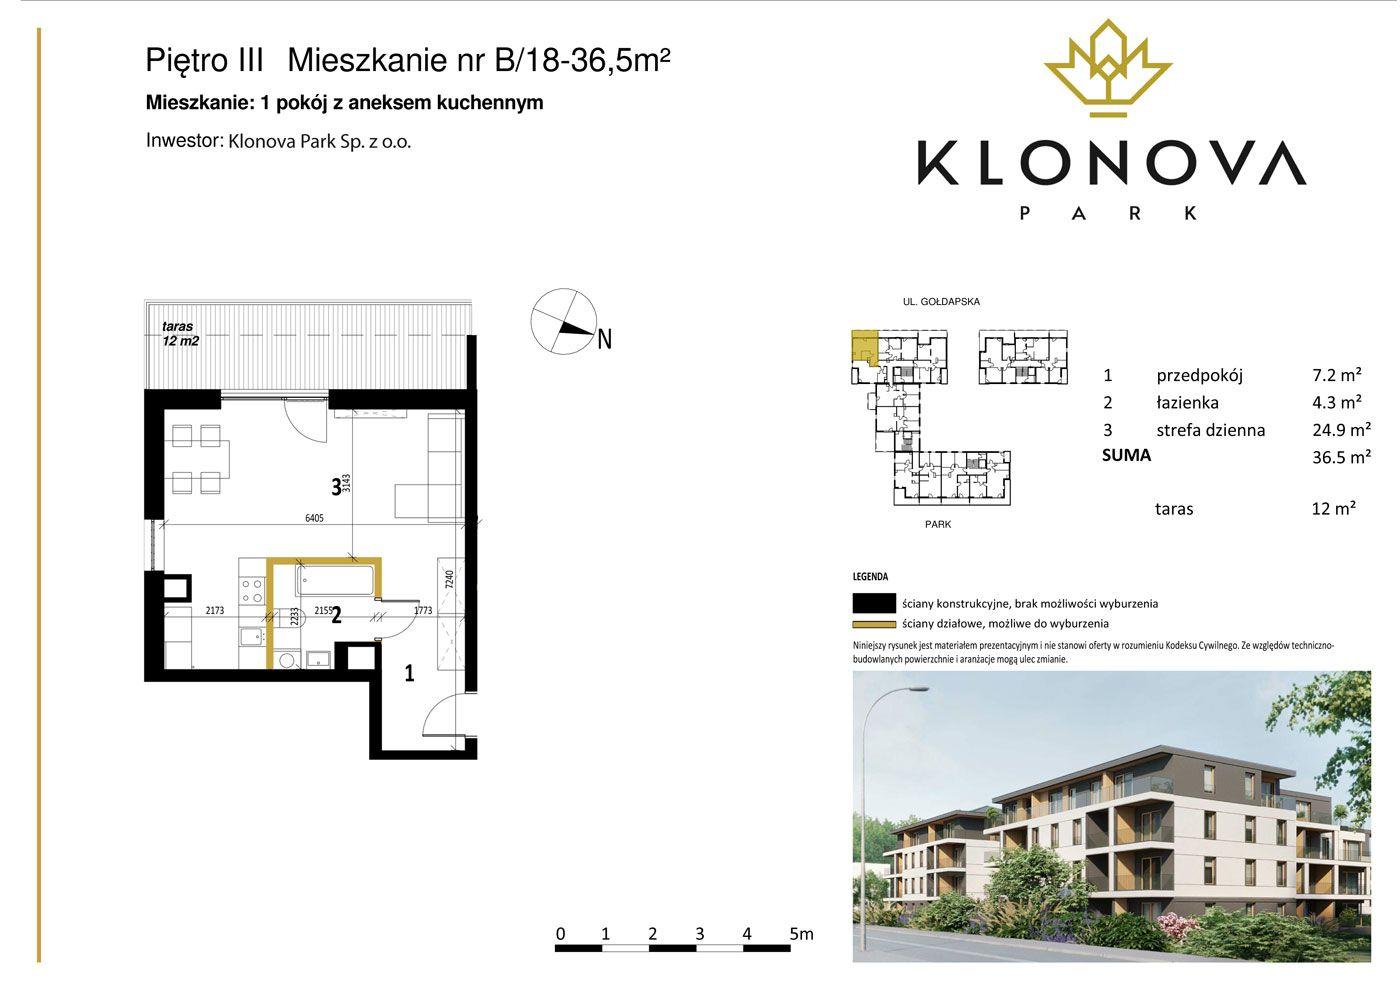 Apartamenty Klonova Park - Plan mieszkania B/18